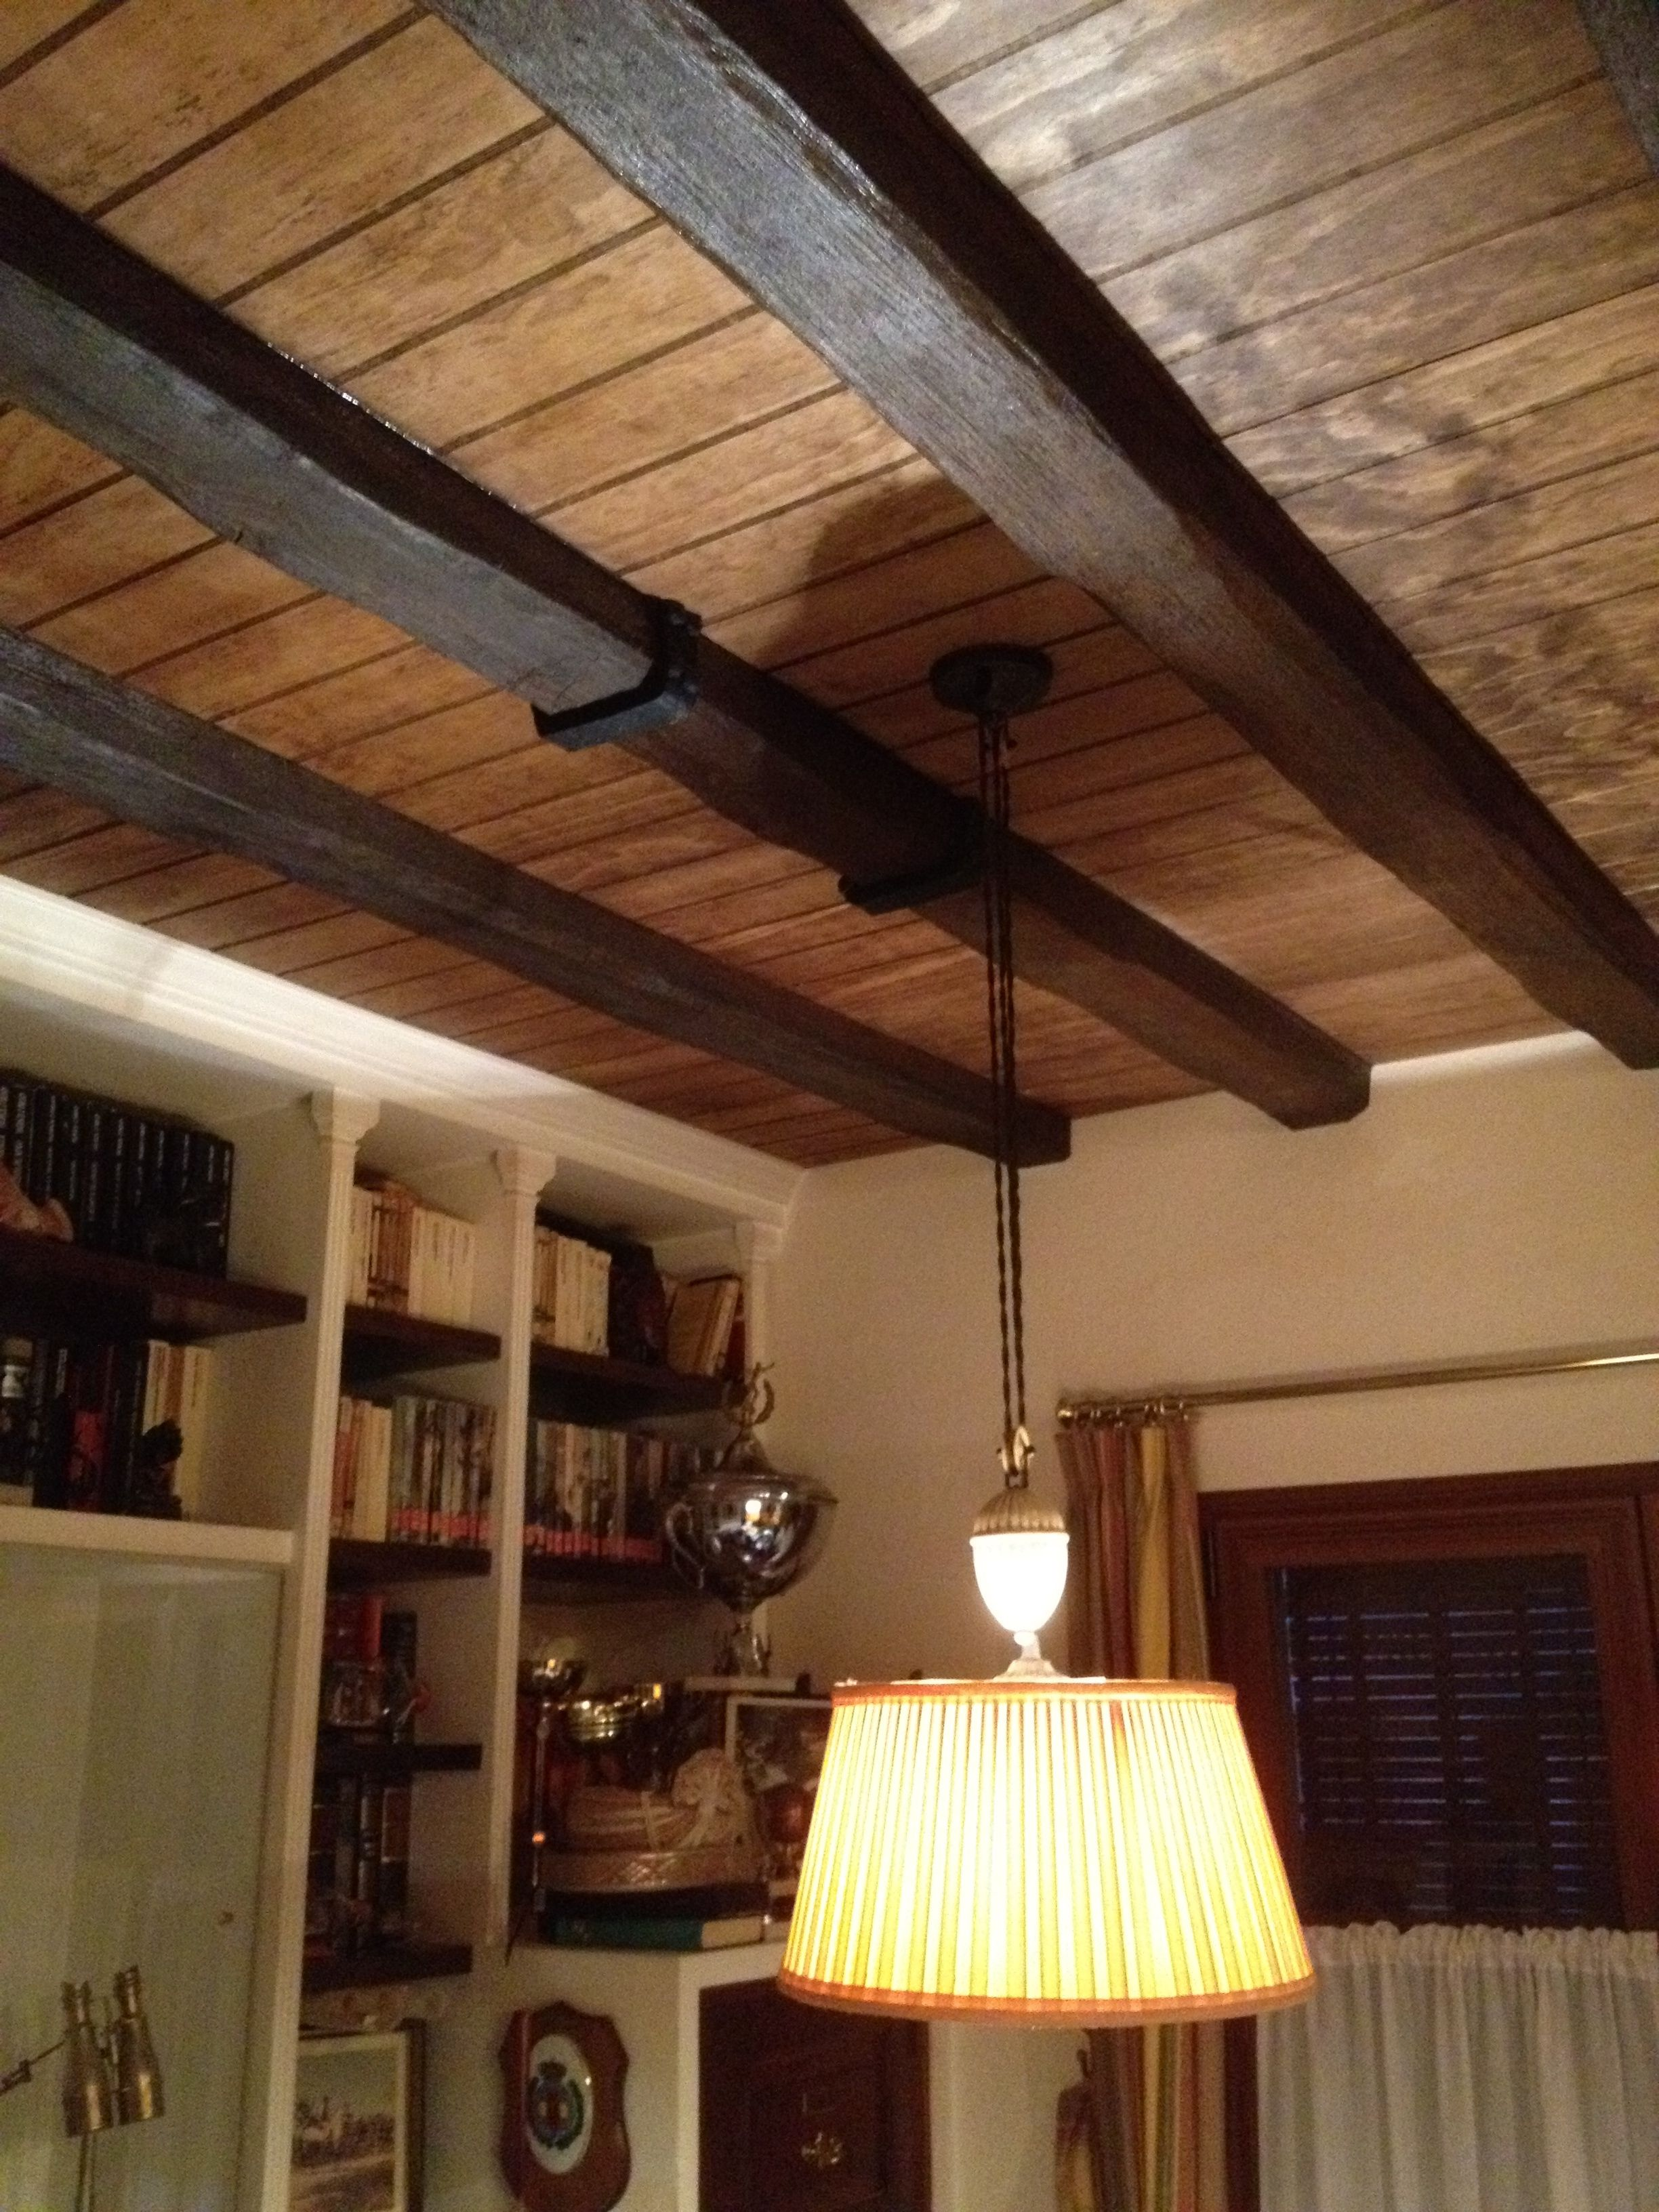 Forrado de techos con madera ranurada muebles indigo arte decorativo pinterest madera - Techados de madera ...